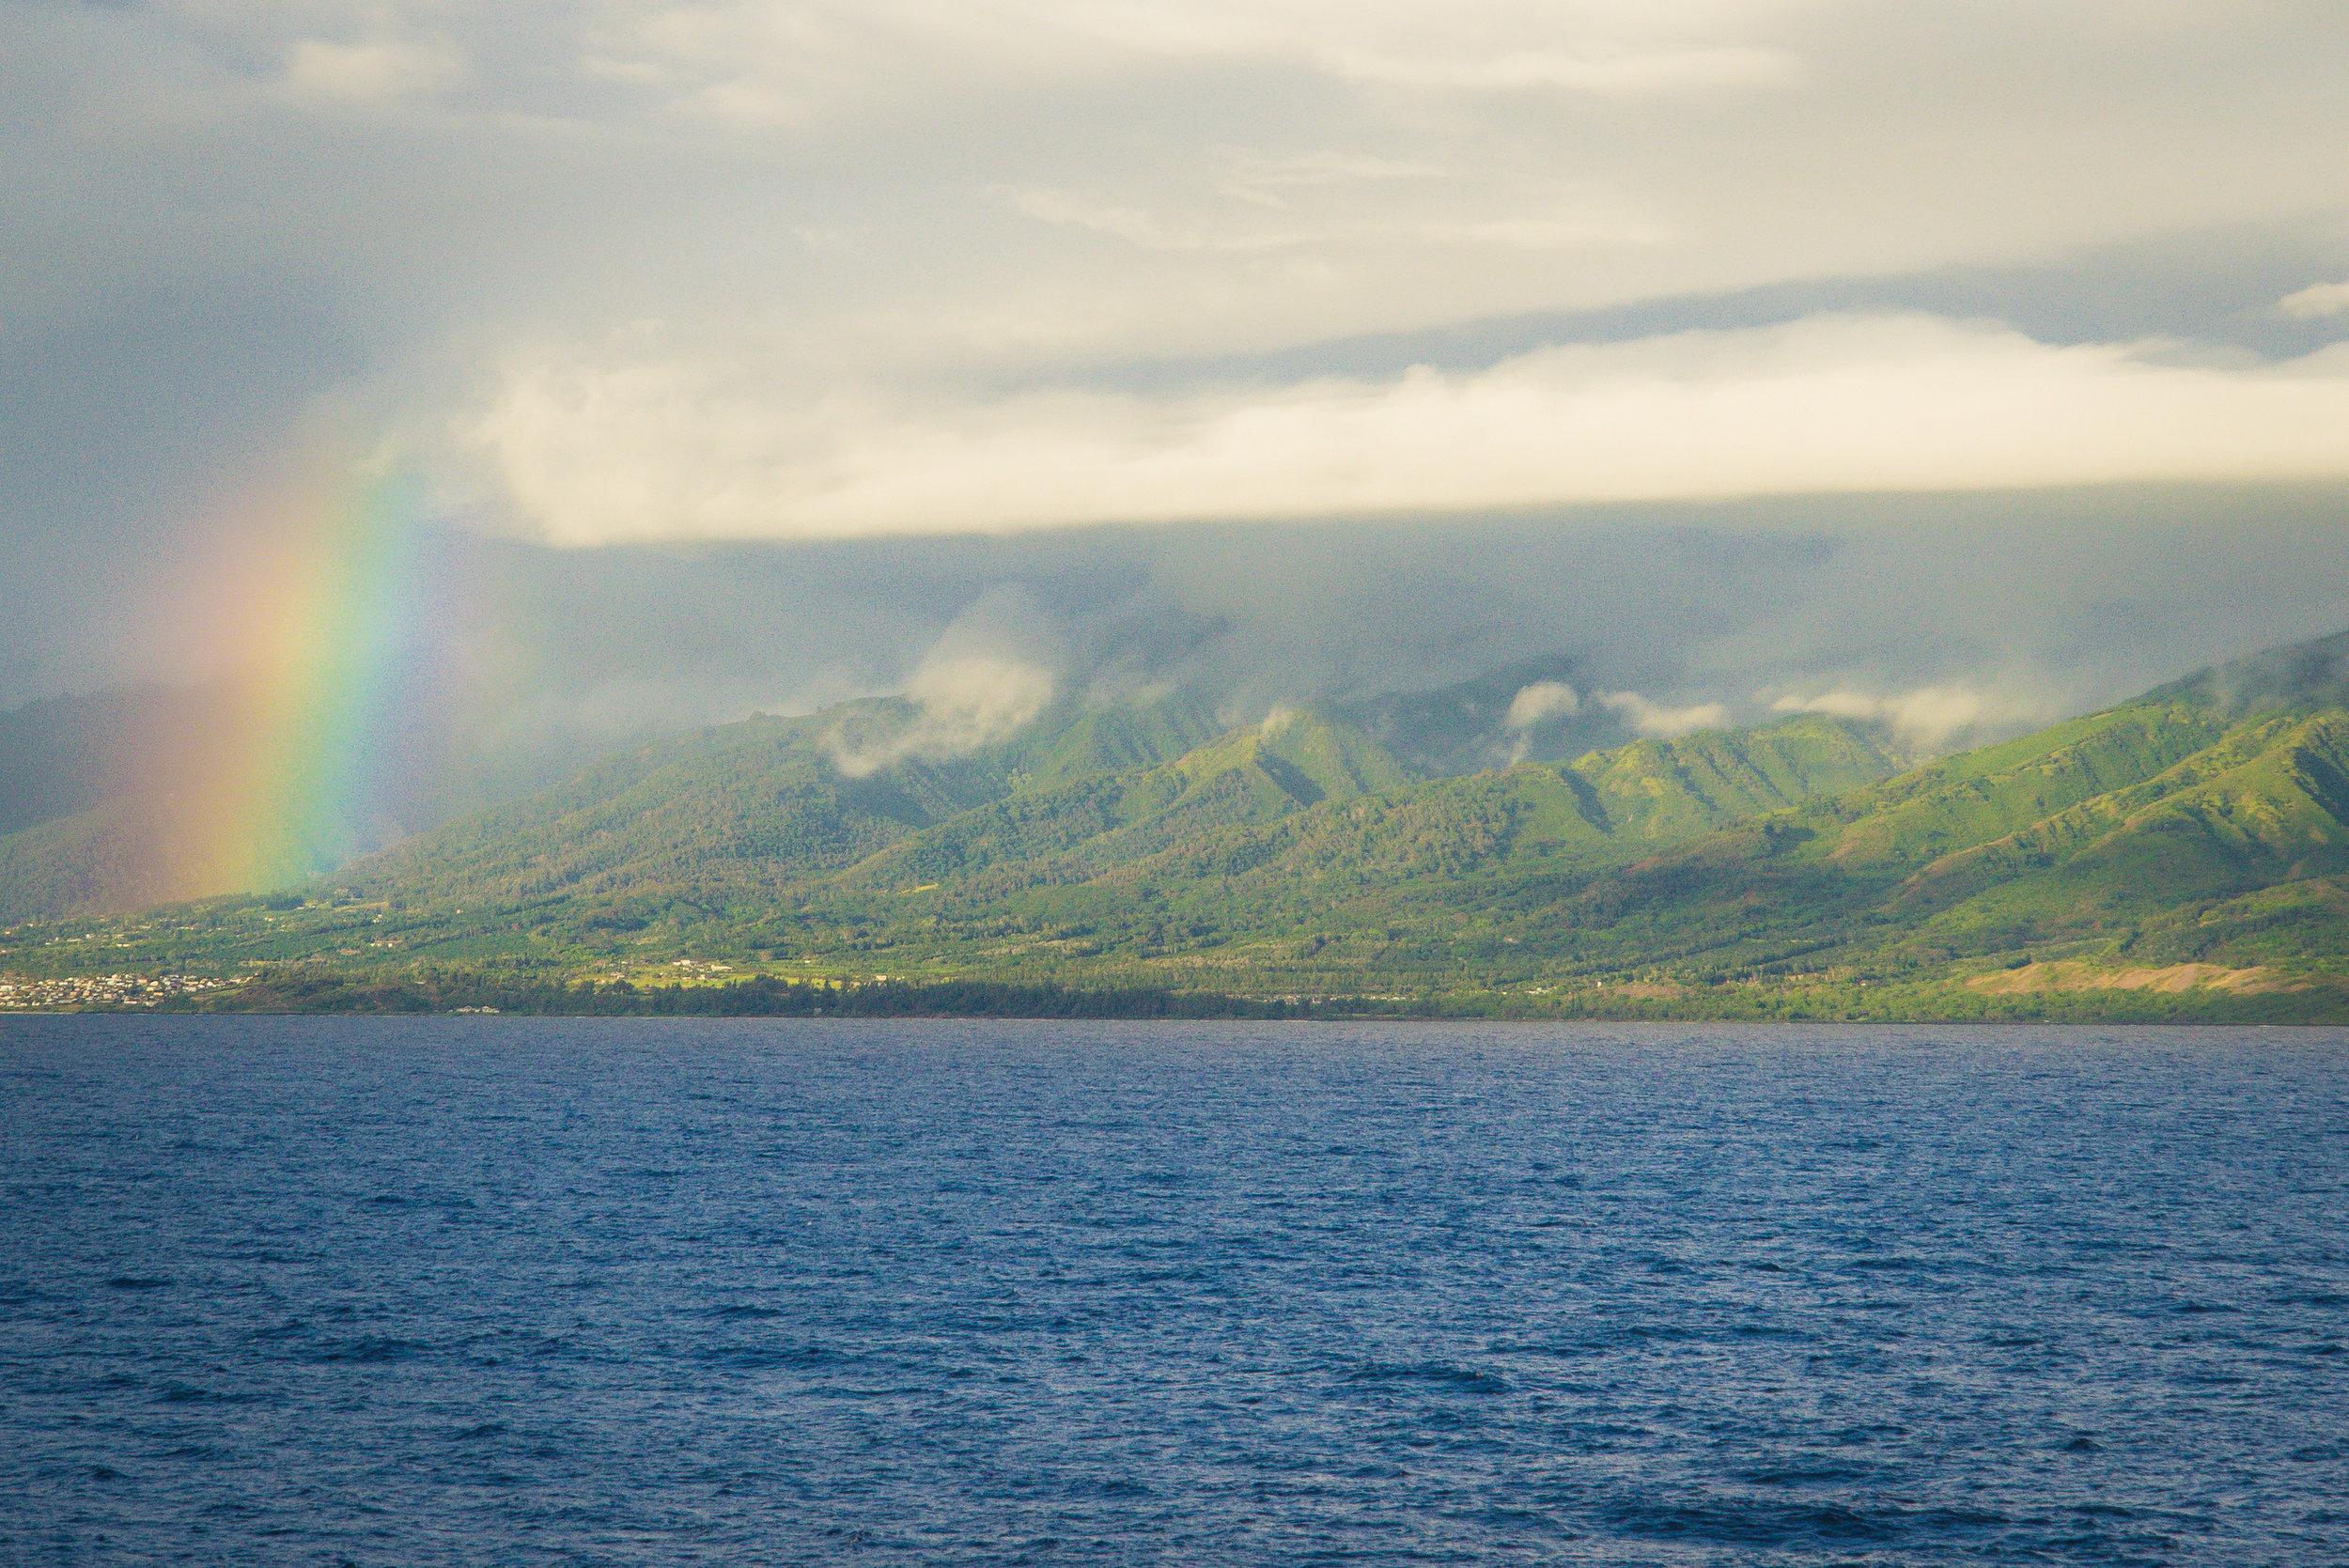 Maui Island, Hawaii, 2017